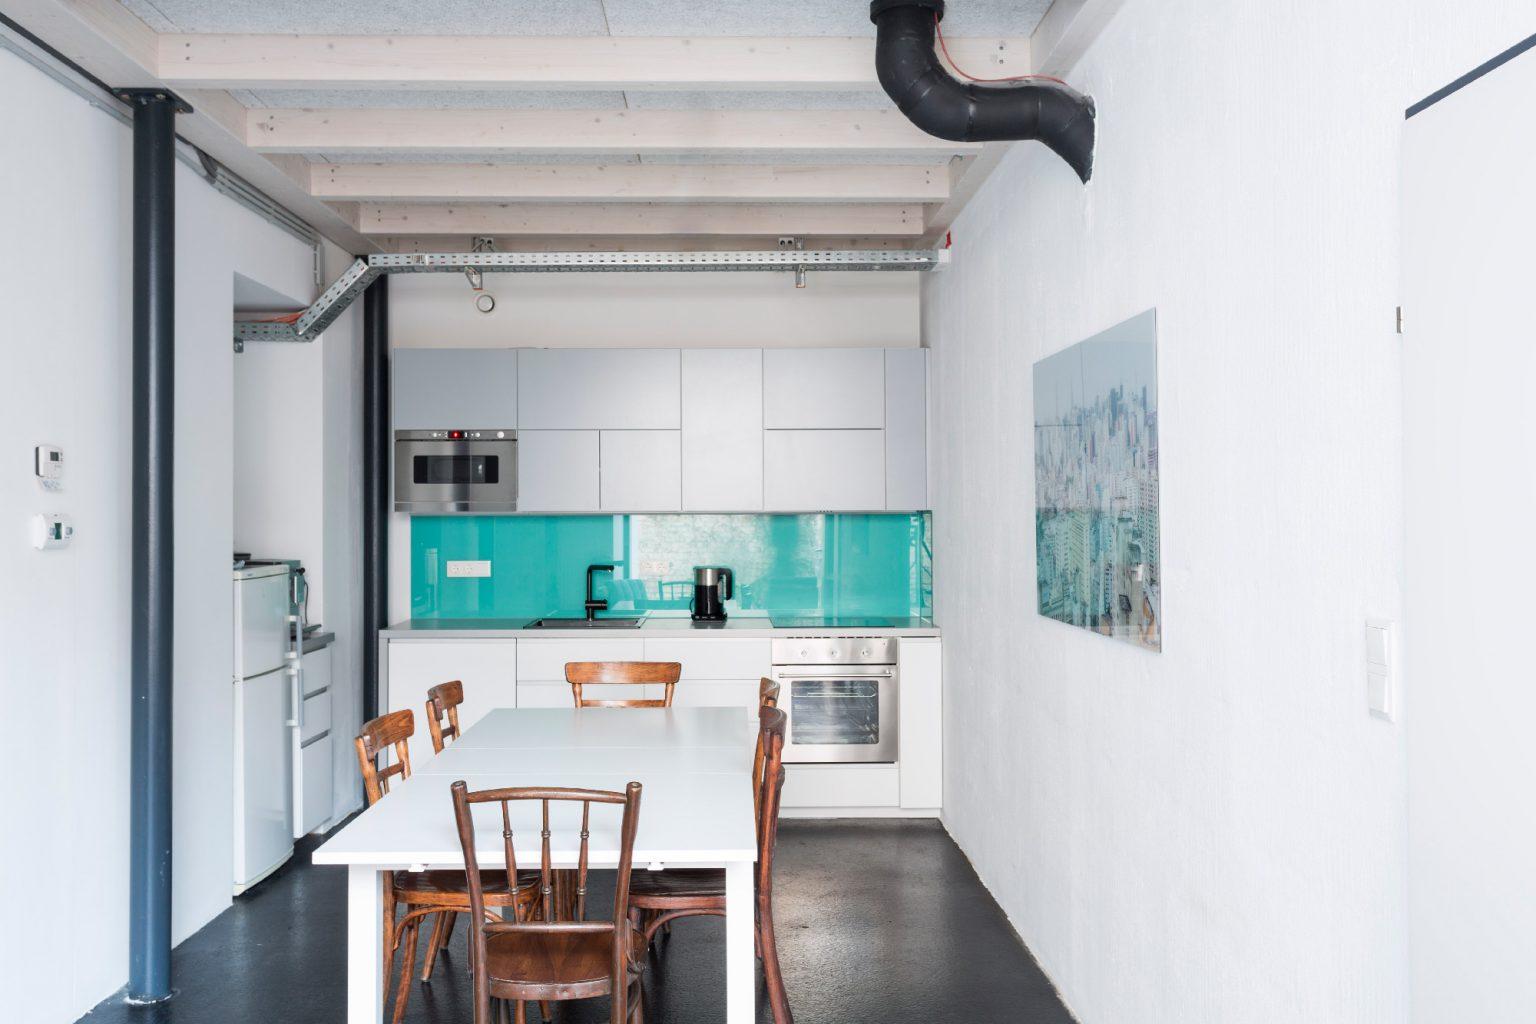 Coworking Space Studio Totale in Wien mit Küche